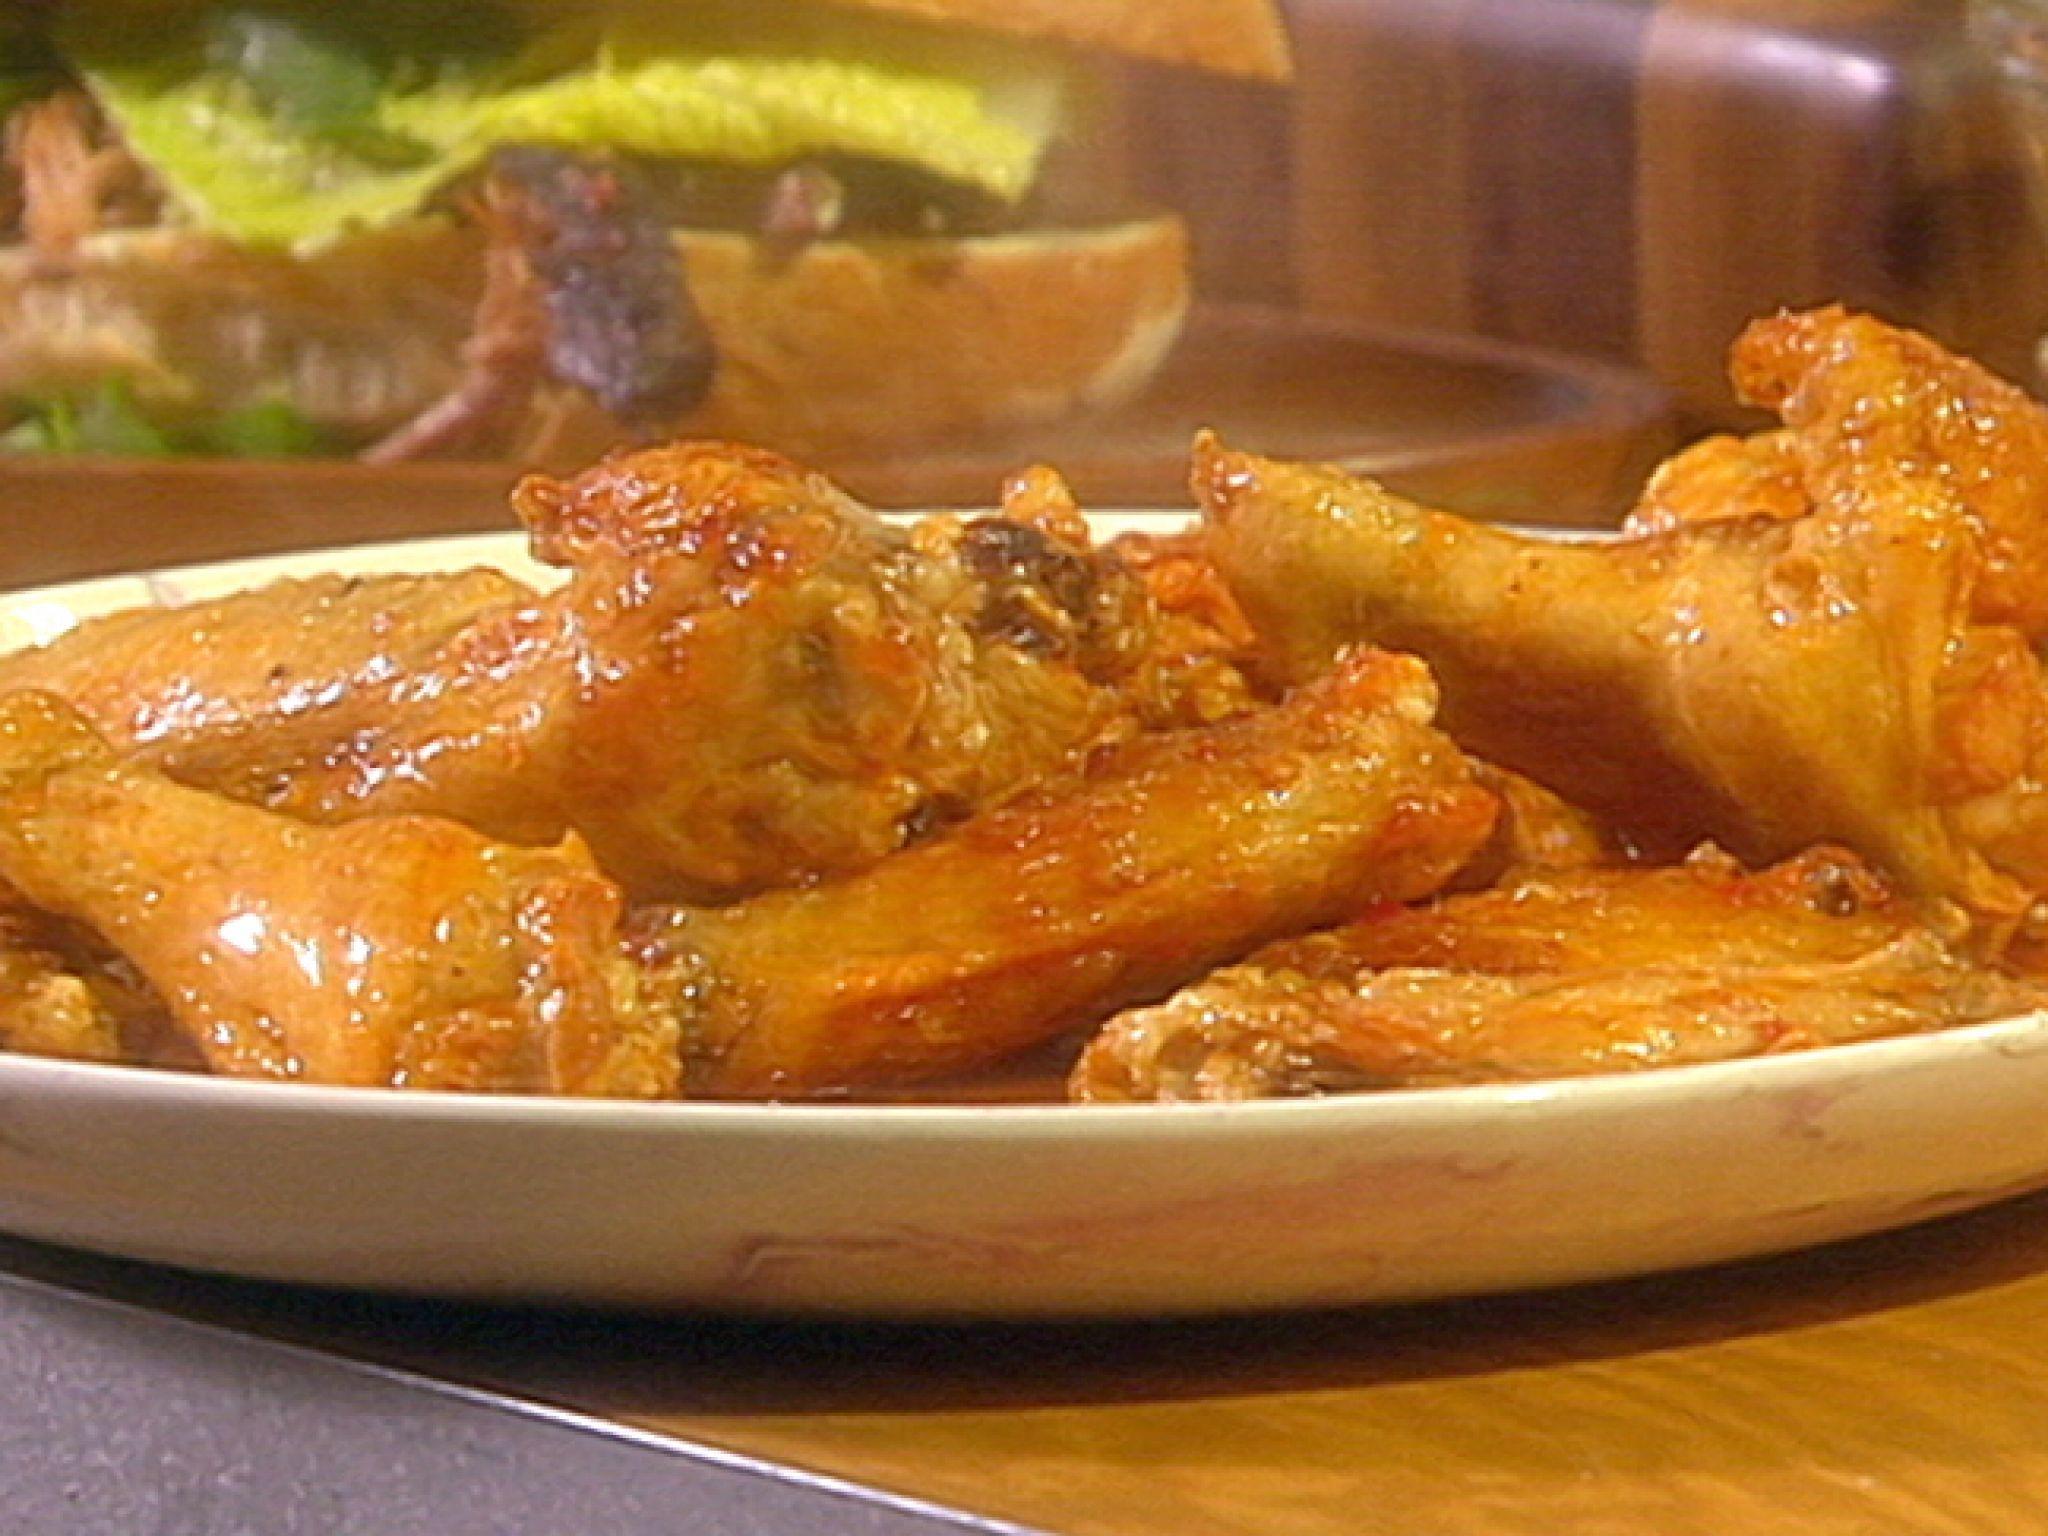 Korean chicken wings recipe korean chicken wings korean chicken meat korean chicken wings recipe from guy fieri via food network forumfinder Choice Image